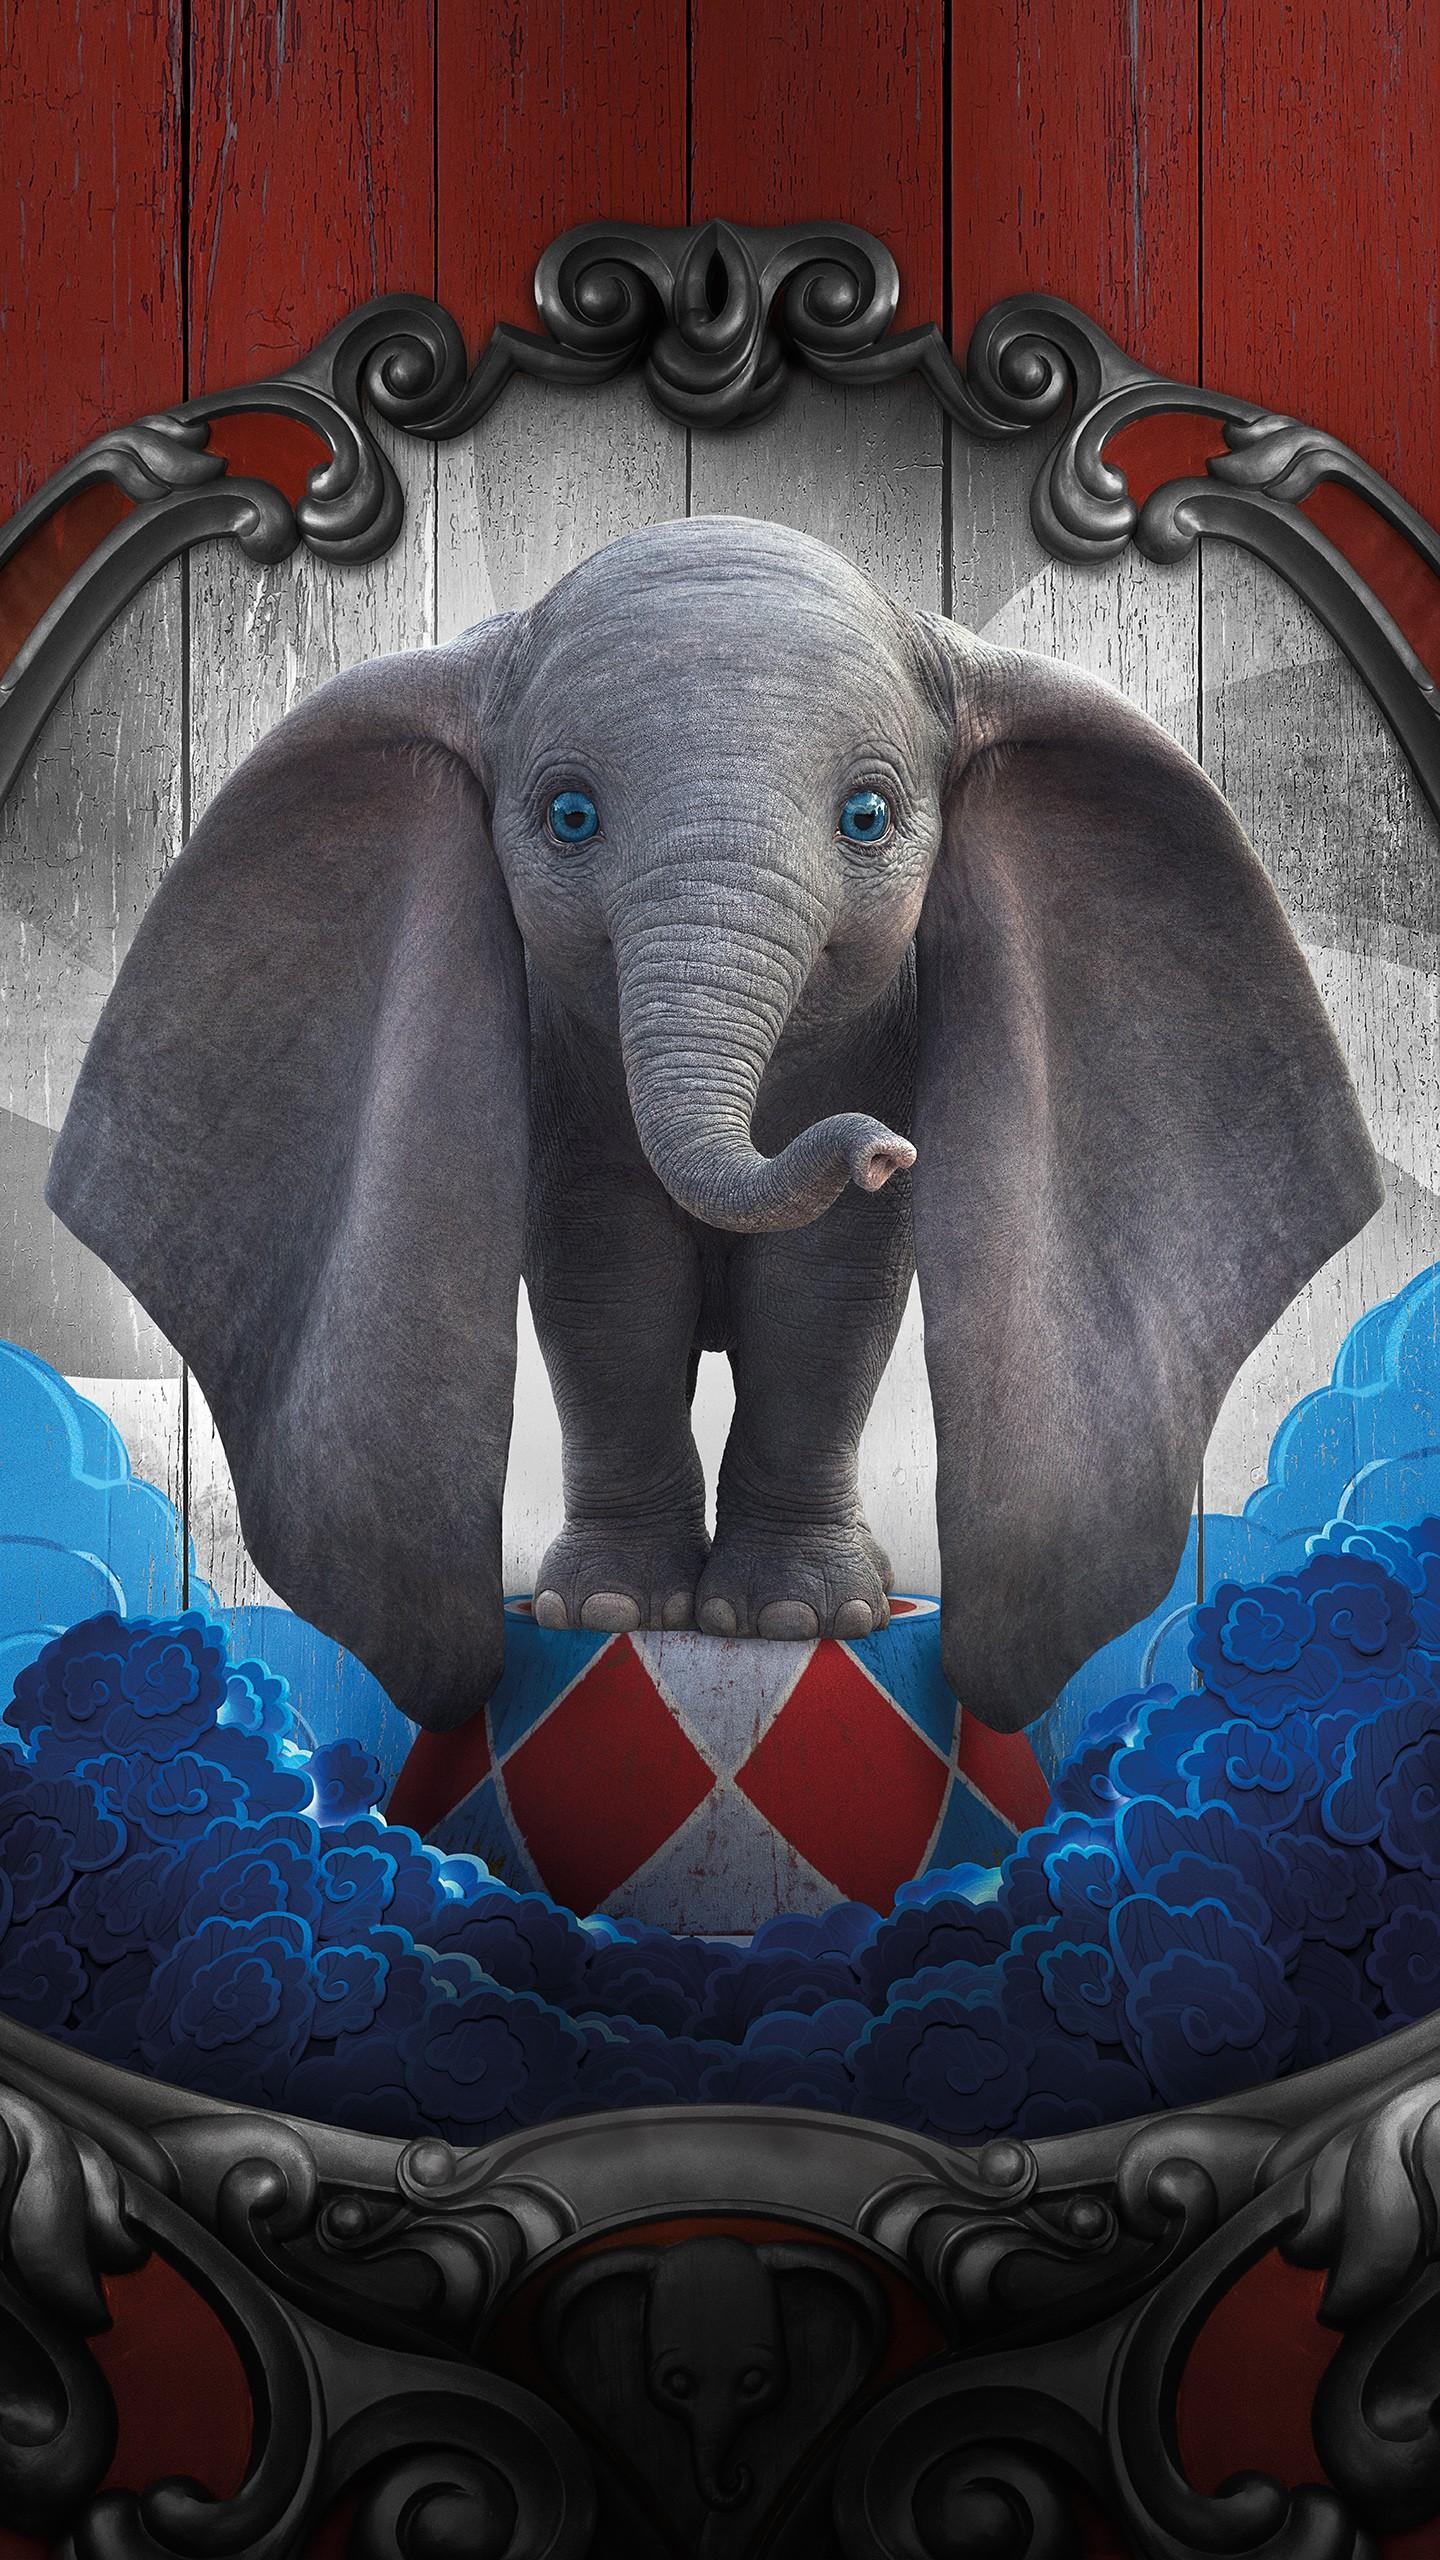 Wallpaper Iphone 6 Iron Man Dumbo Elephant 2019 4k 8k Wallpapers Hd Wallpapers Id